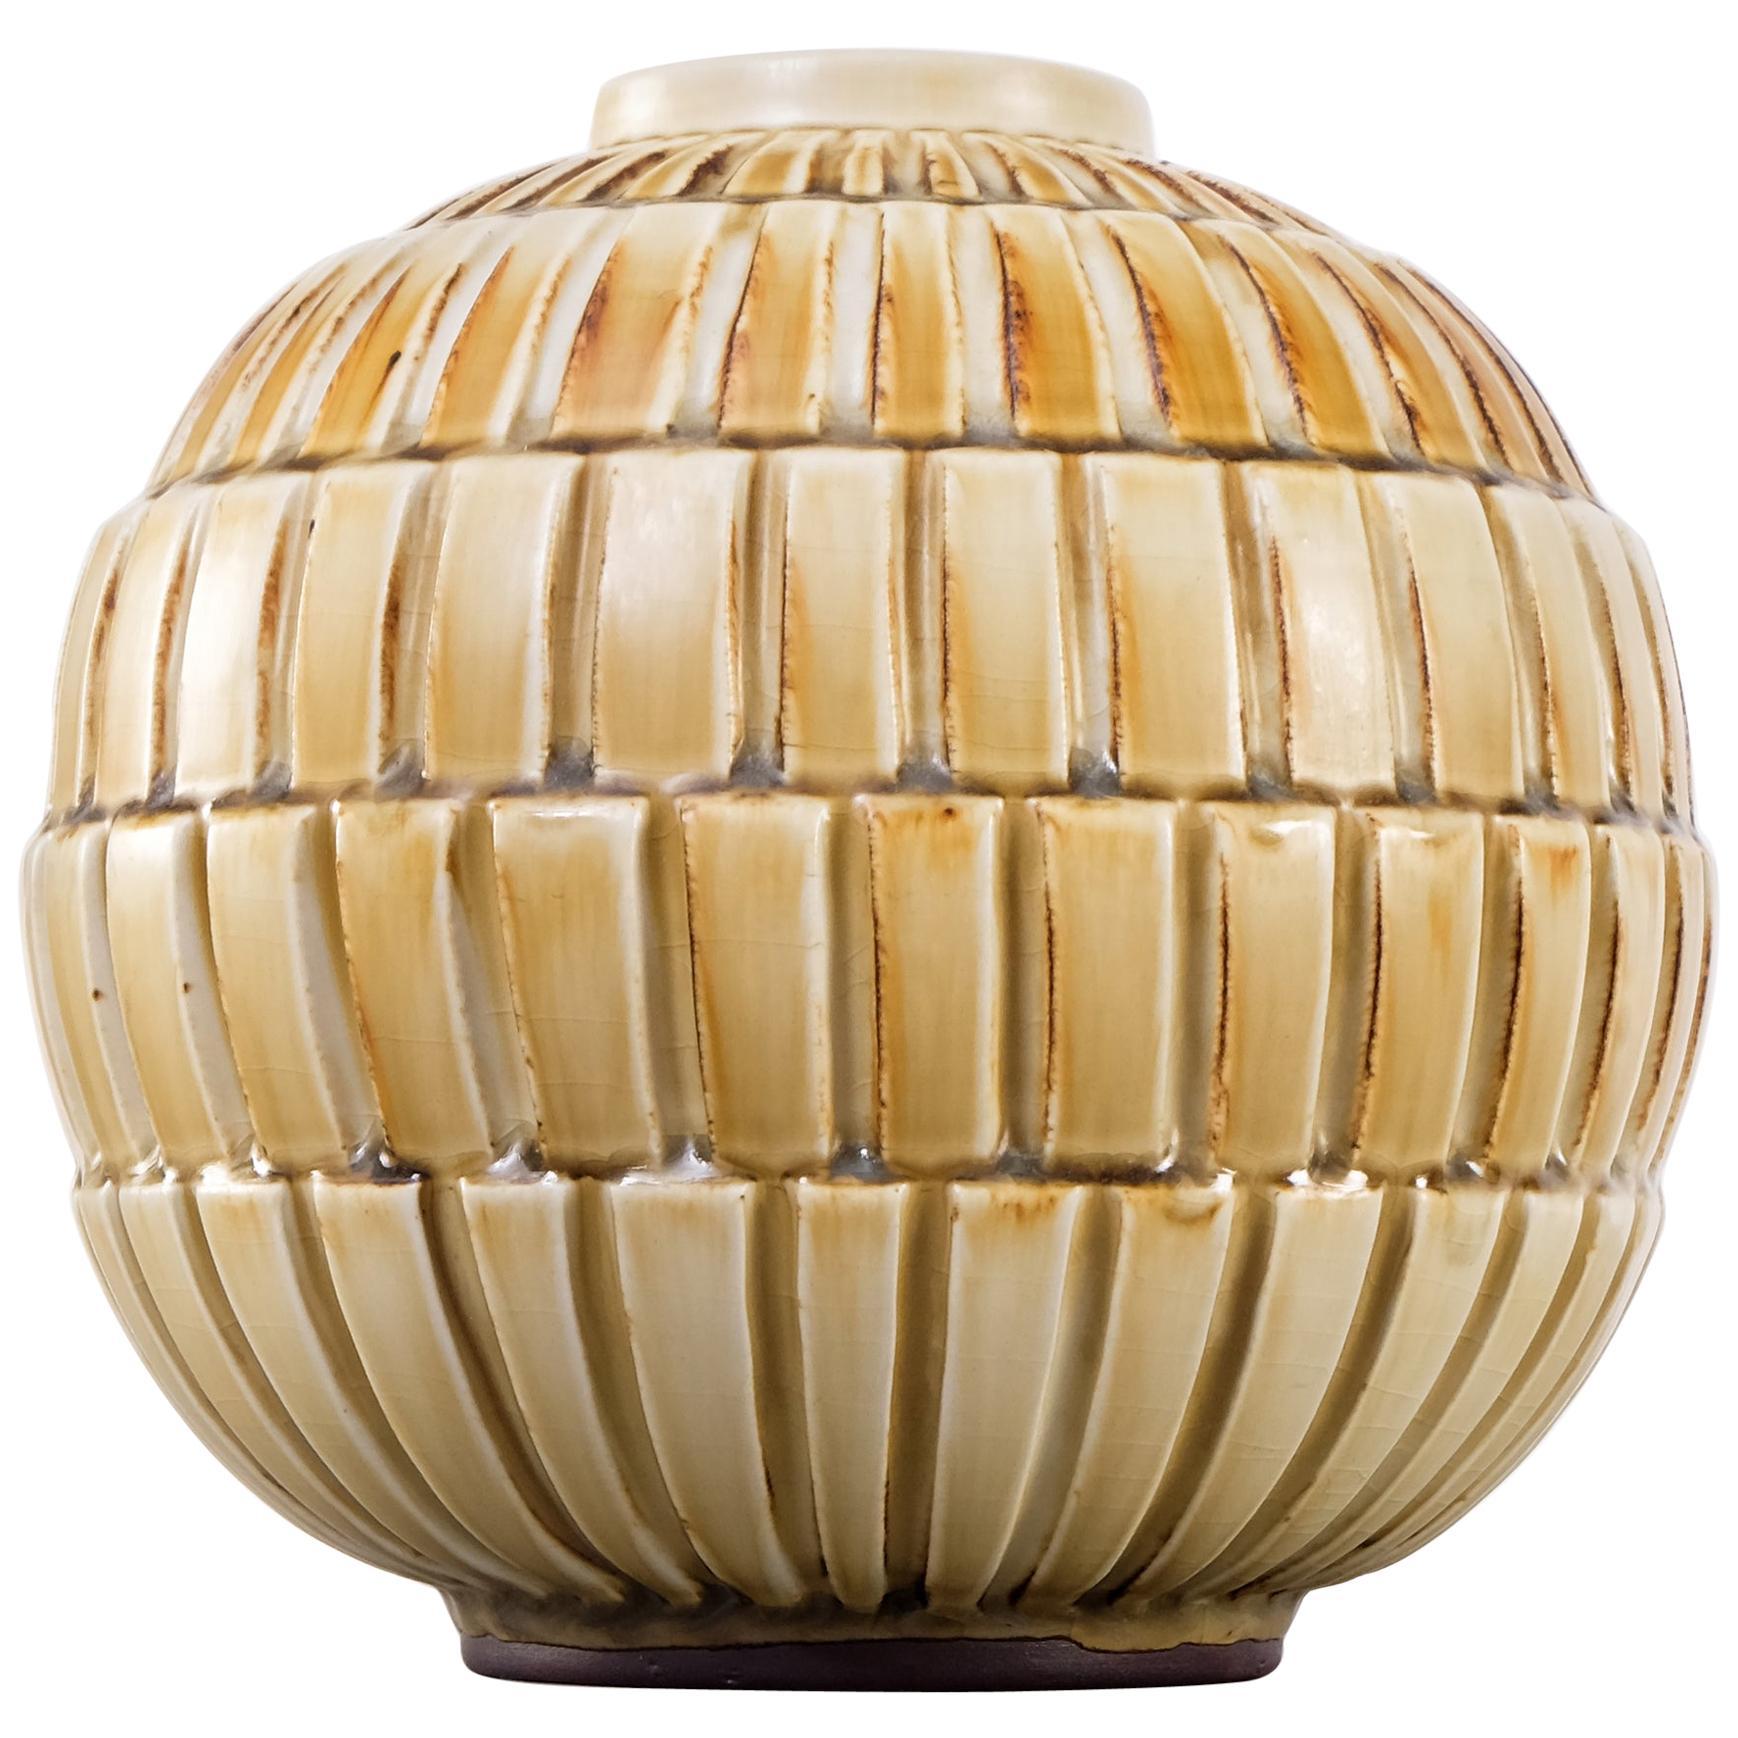 Ceramic Vase by Gertrud Lönegren, Rörstrand, 1930s